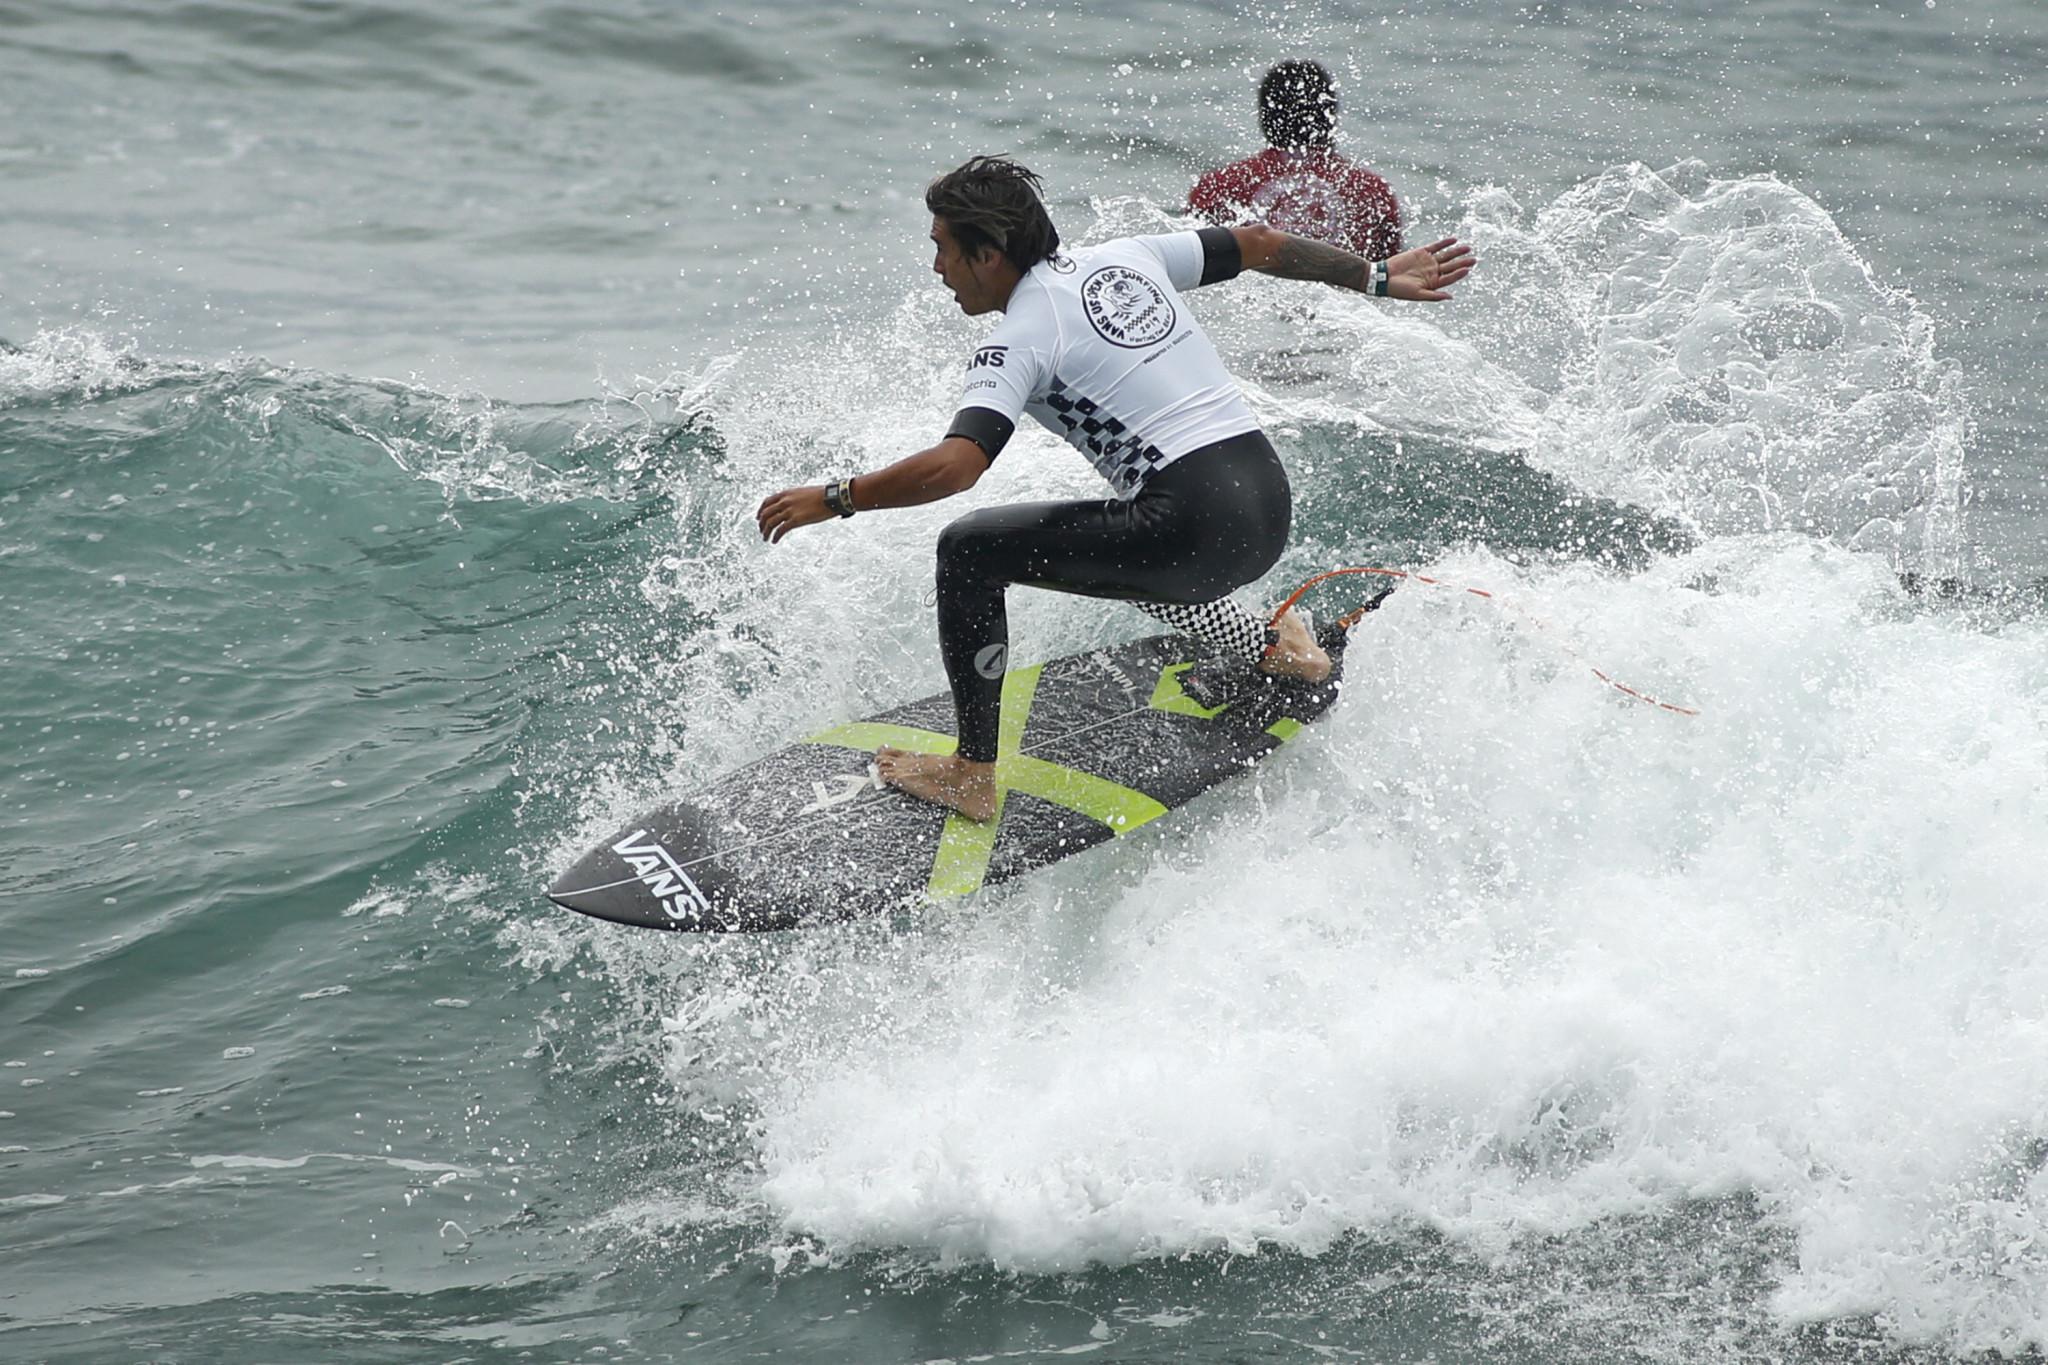 ISA announce Vans as presenting sponsor for World Surfing Games